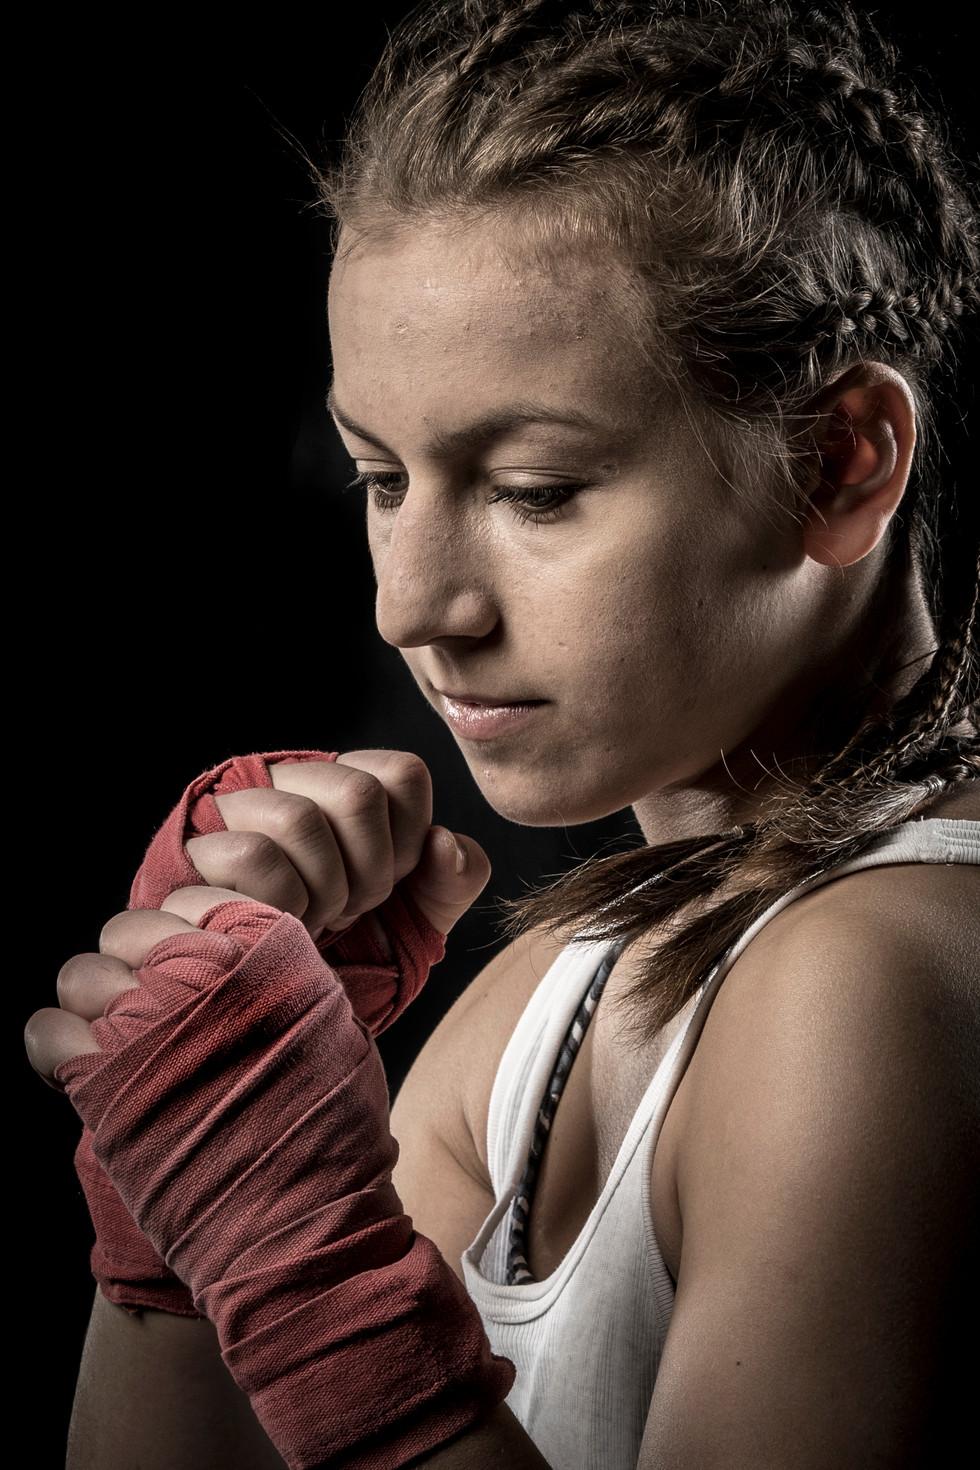 Sportfotografie-Boxen-Boxerin-1.jpg